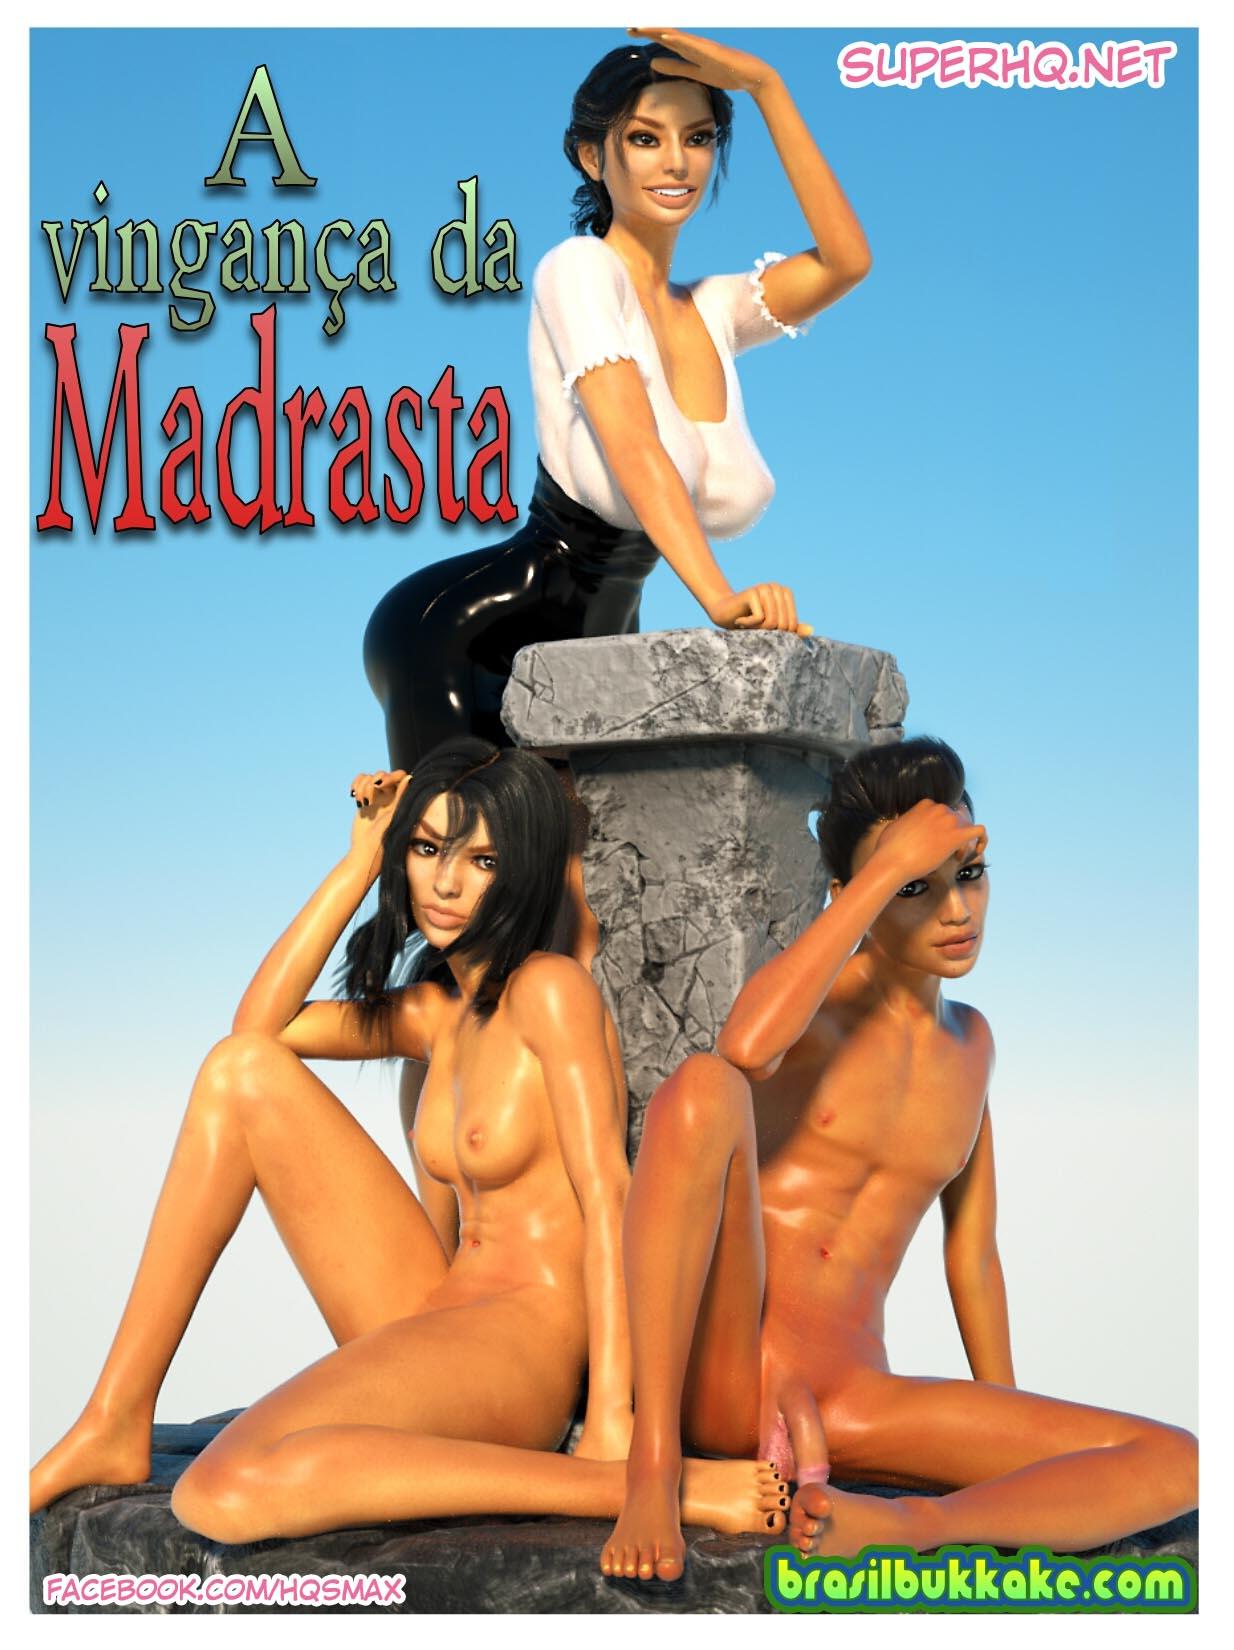 HQ de Sexo - A Vingança da Madrasta - Futanari 3D